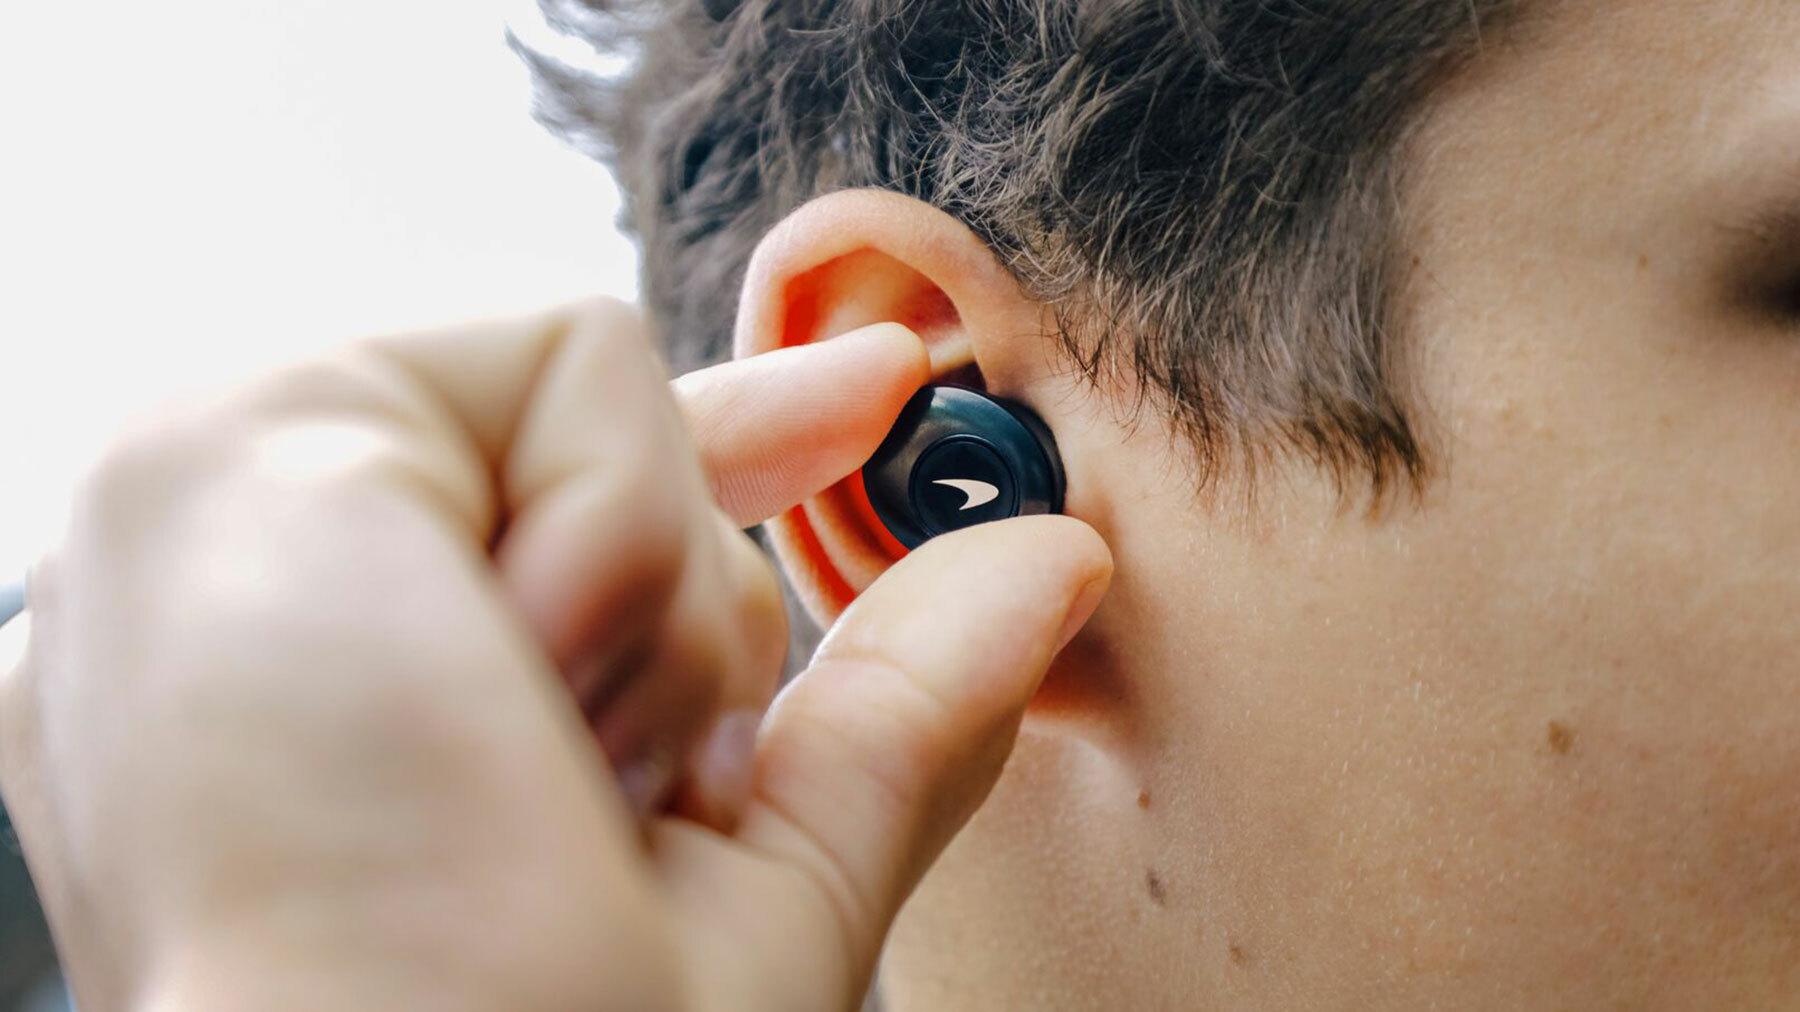 LANDO NORRIS HOLDING T5 II ANC EARPHONE IN HIS EAR